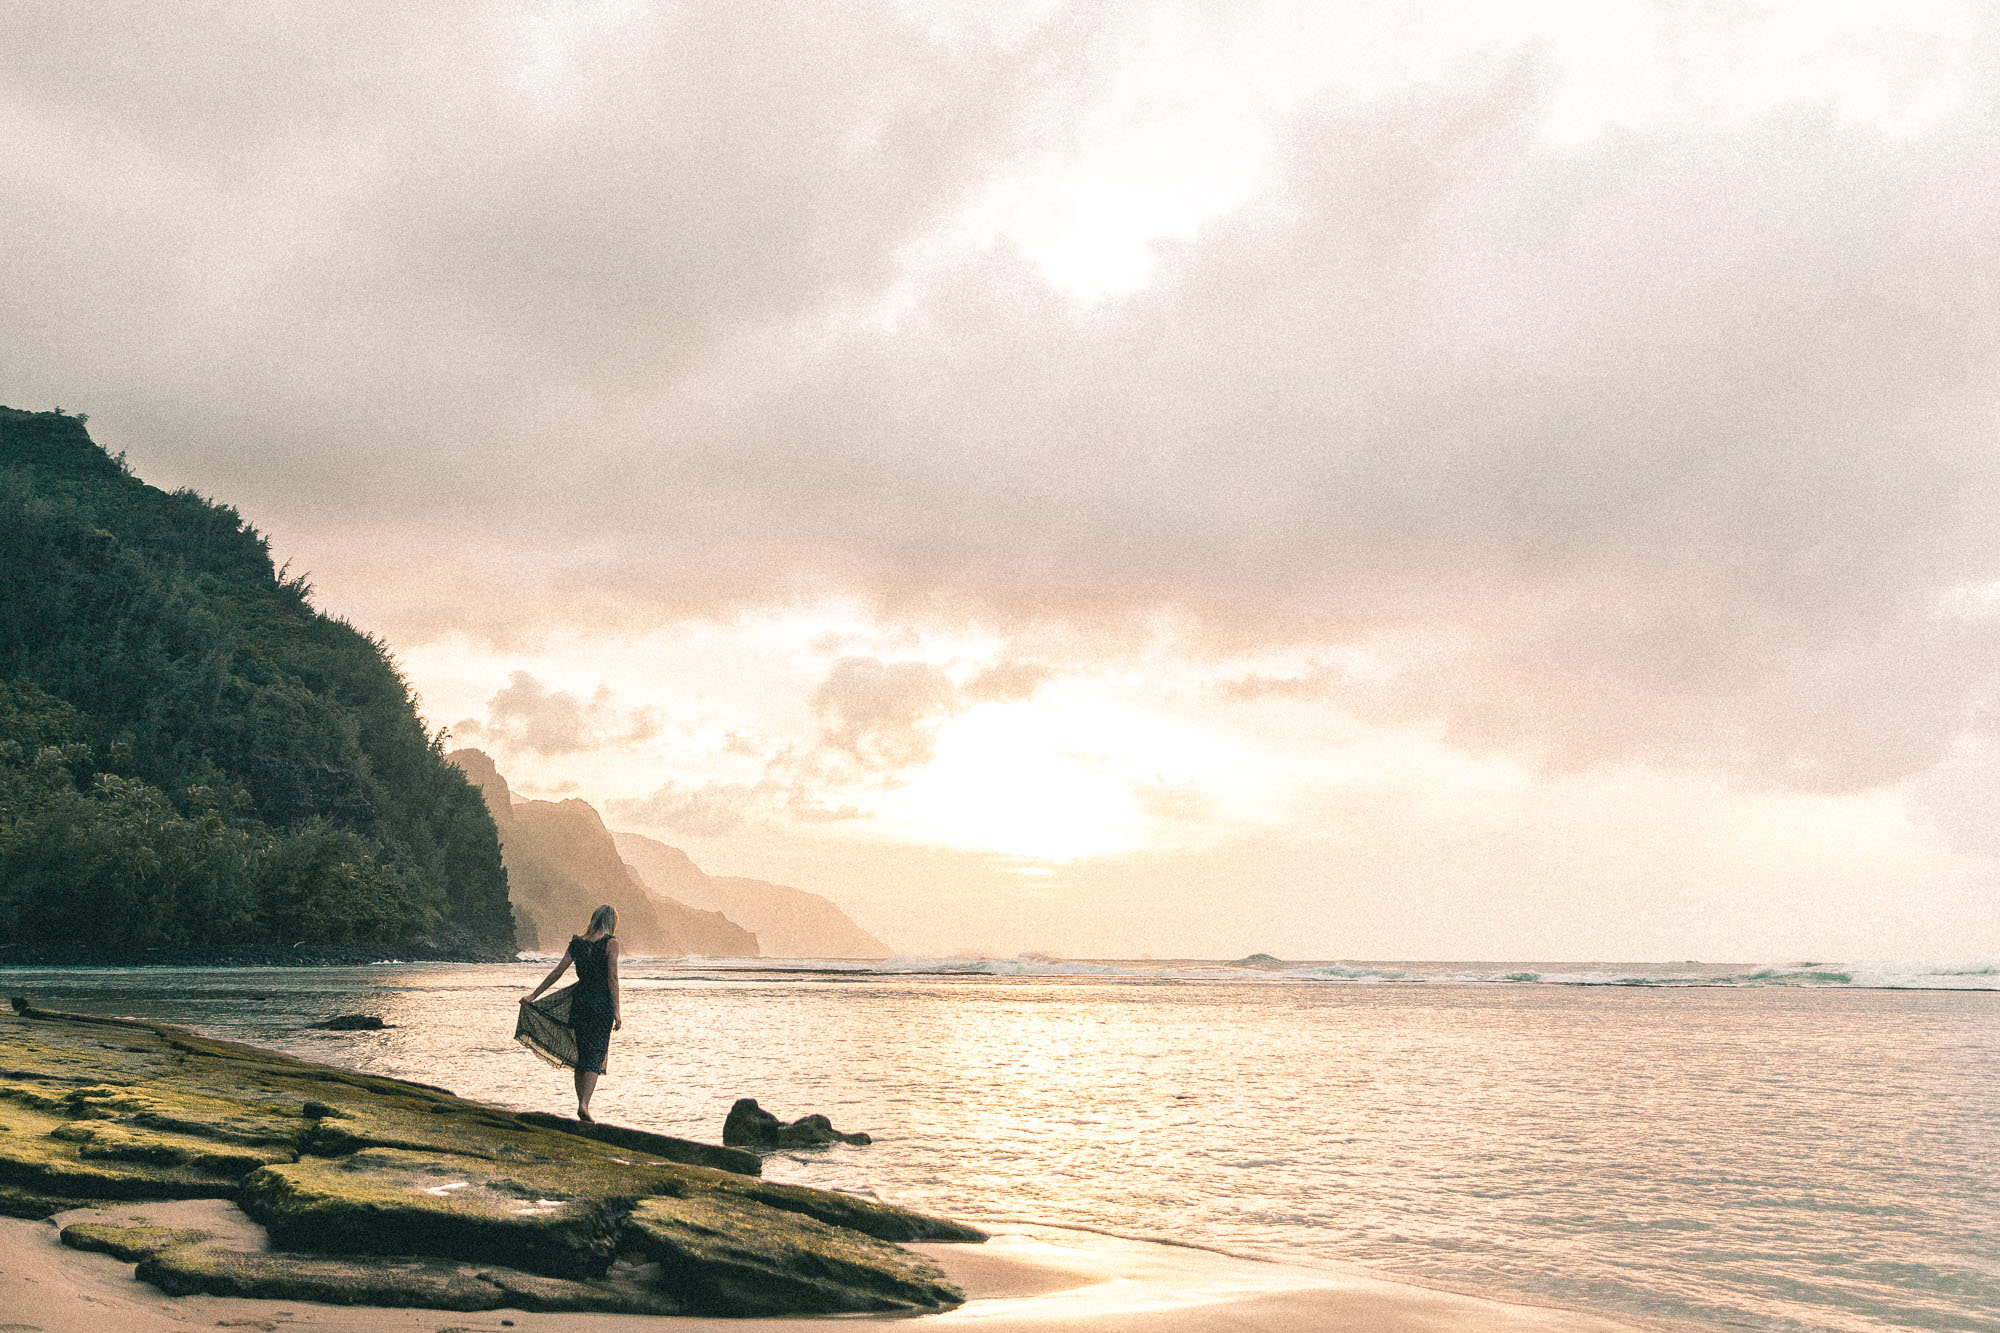 Ke'e Beach Sunset Along Na Pali Coast Kauai Travel Guide via Find Us Lost Travel Blogger Selena Taylor